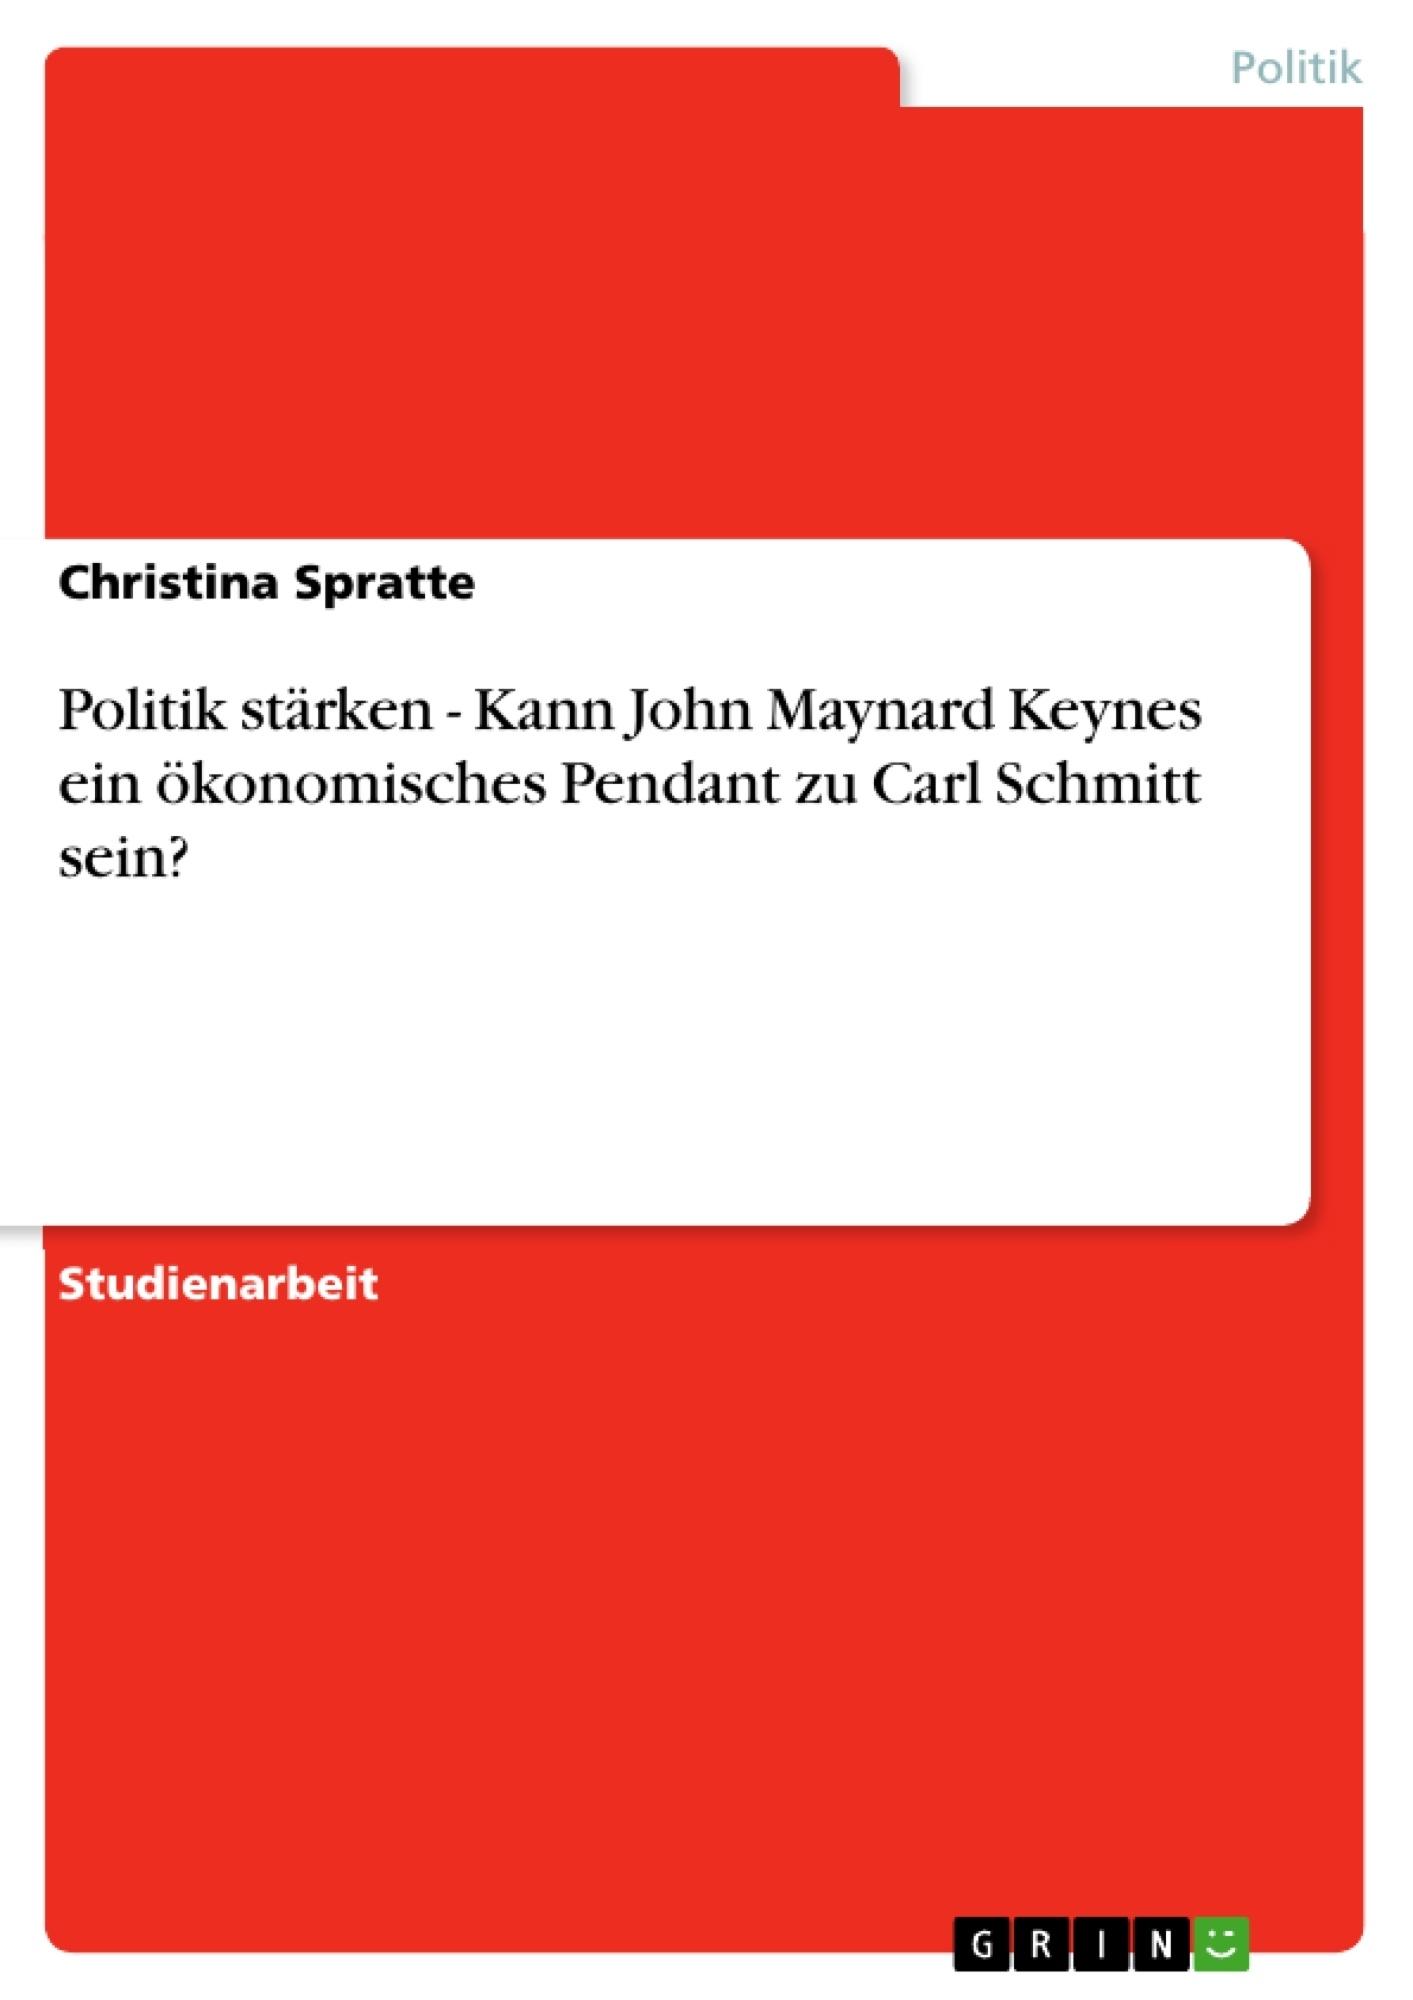 Titel: Politik stärken - Kann John Maynard Keynes ein ökonomisches Pendant zu Carl Schmitt sein?